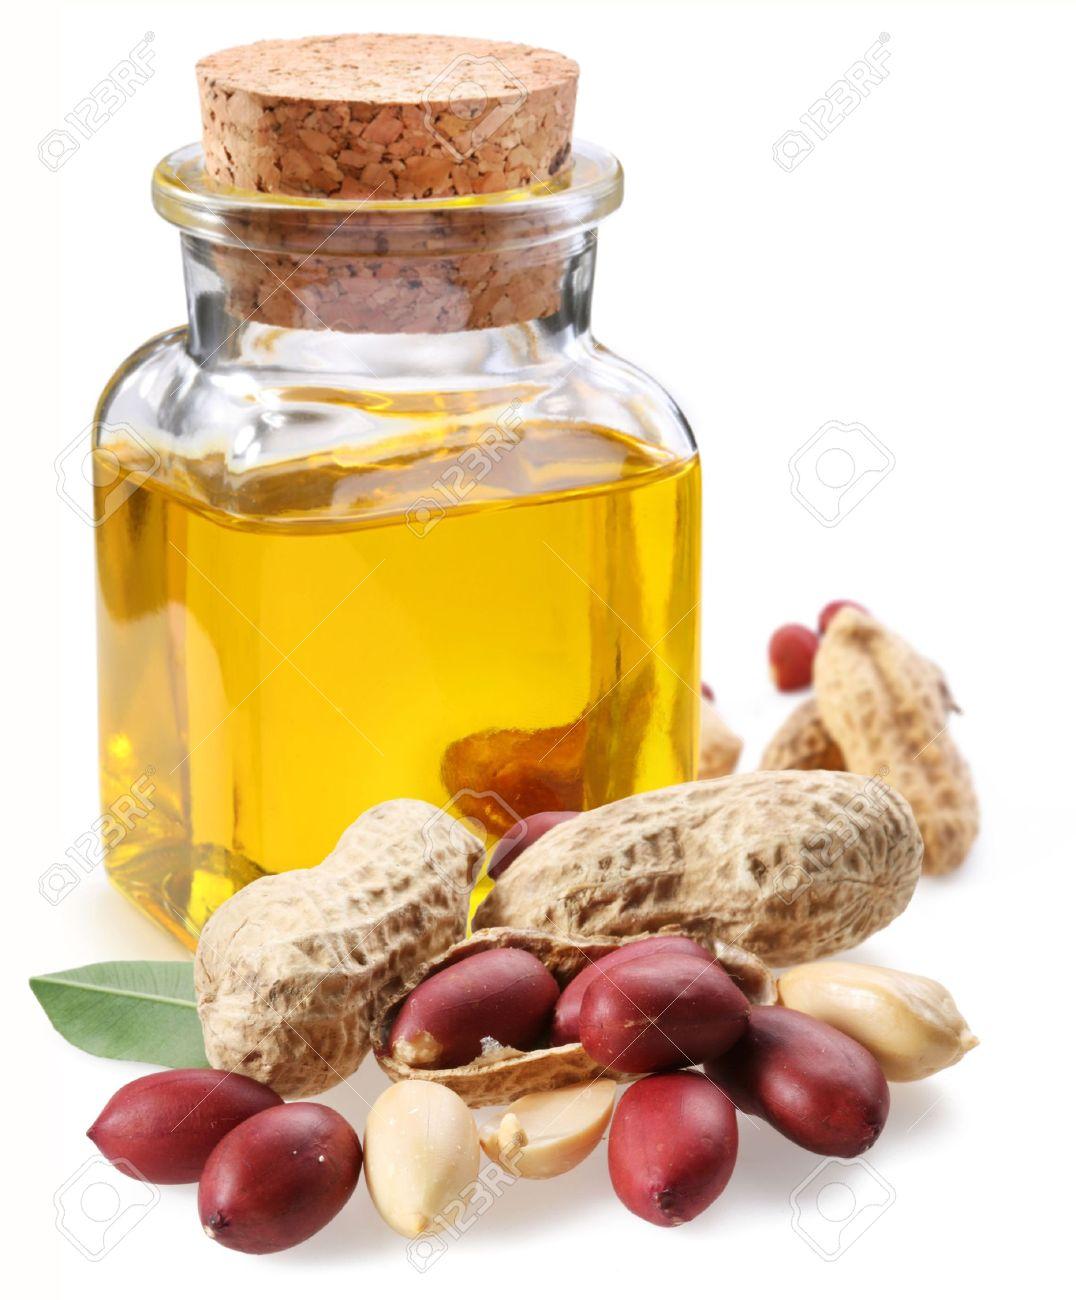 Oil clipart peanut oil. Tradekorea